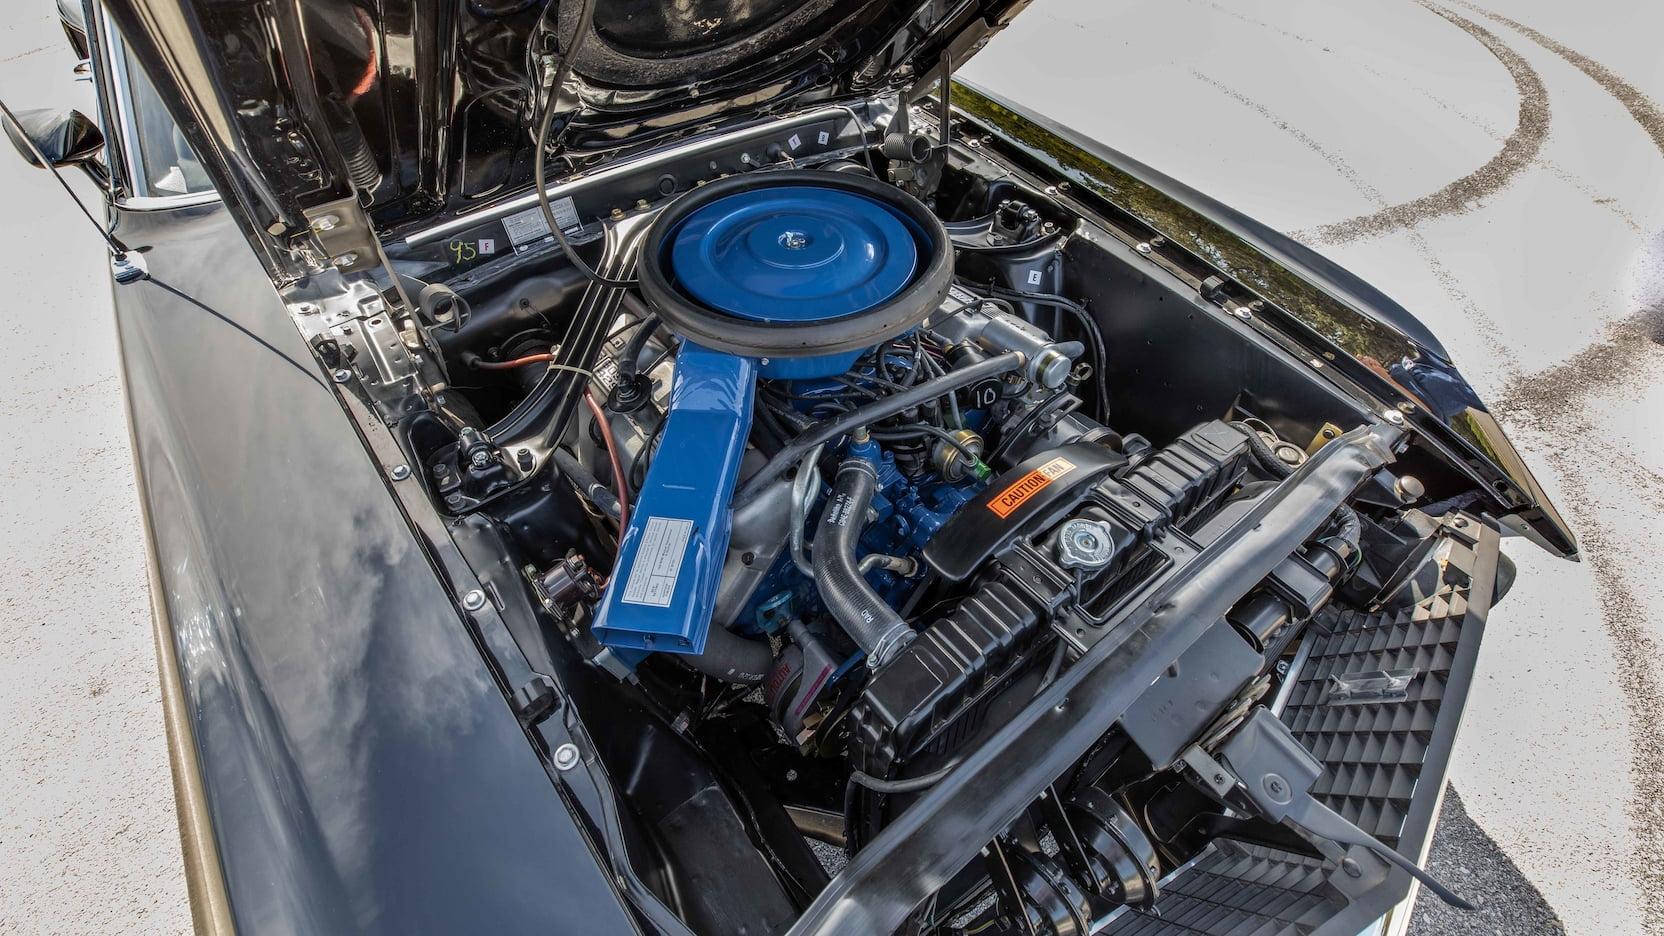 1969 Ford Mustang Boss 429 Fastback Engine Left